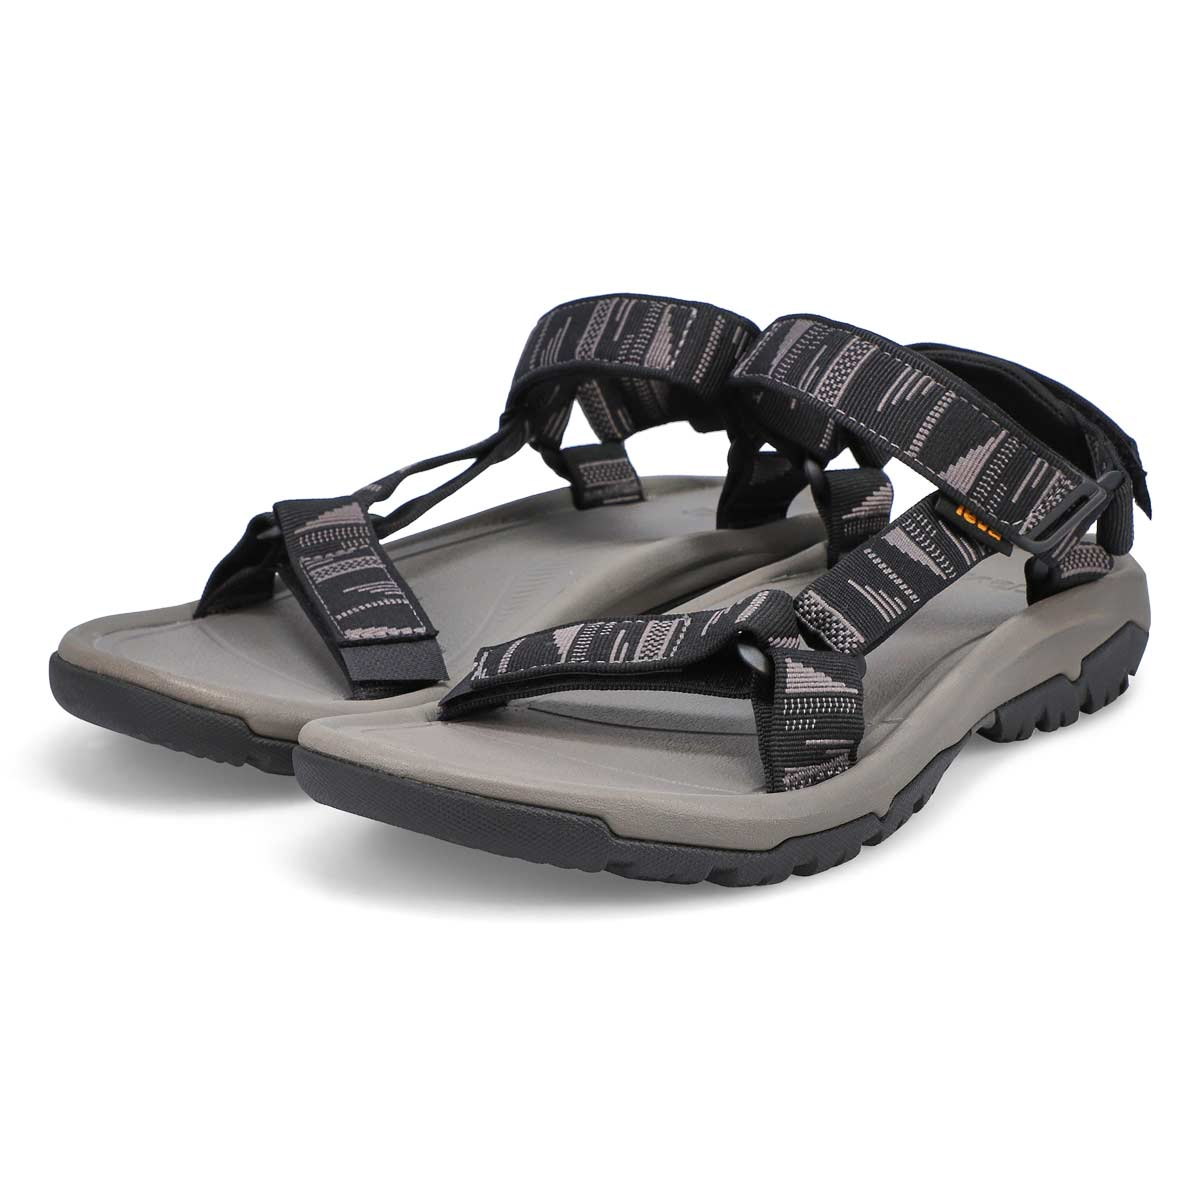 Sandale sport Hurricane XLT2, noir/gris, homme